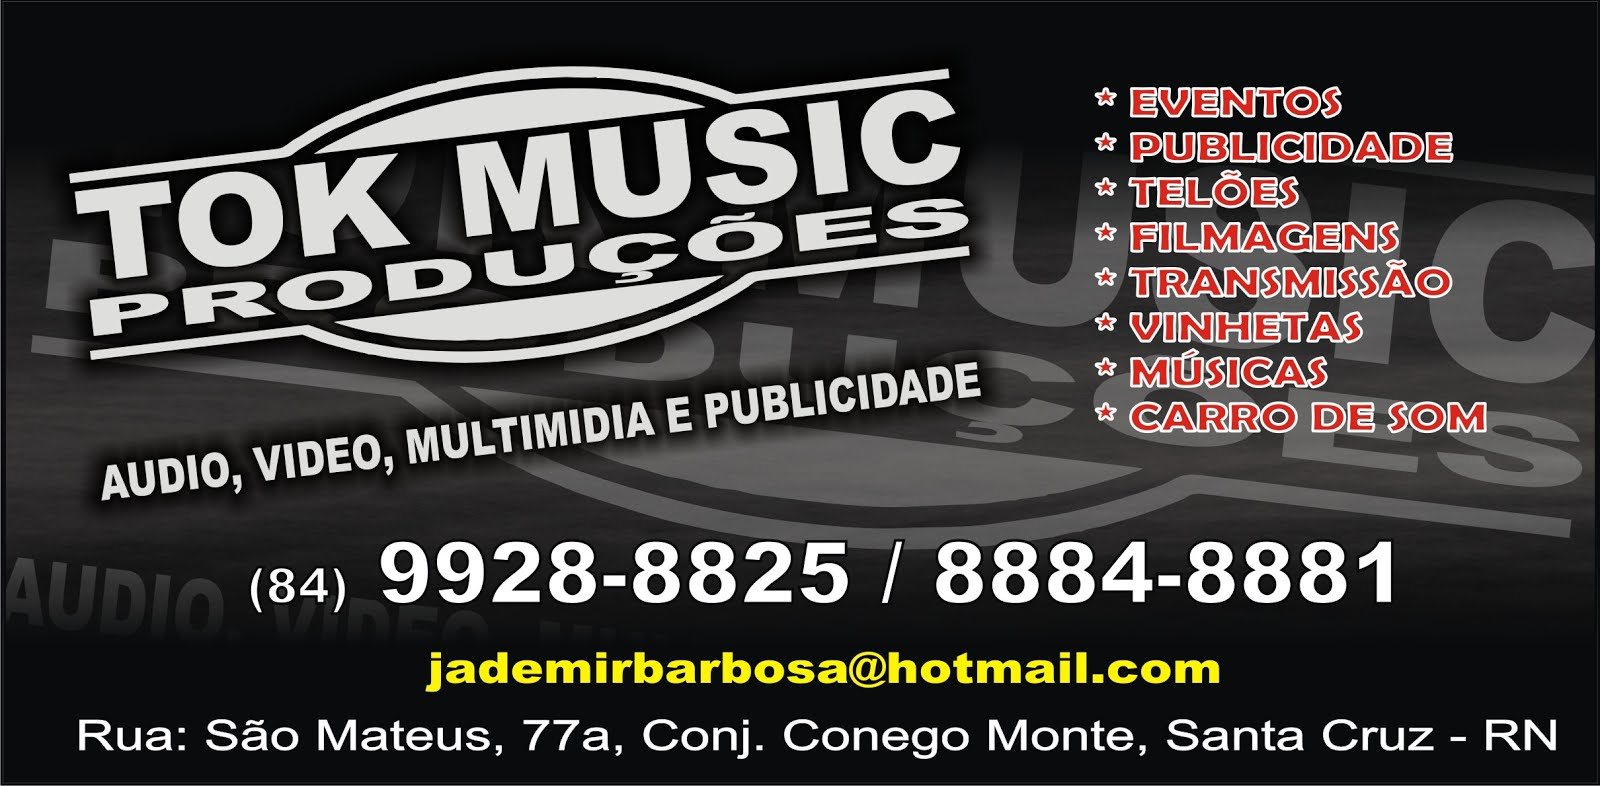 Tok Music Produtora - Jademir Barbosa